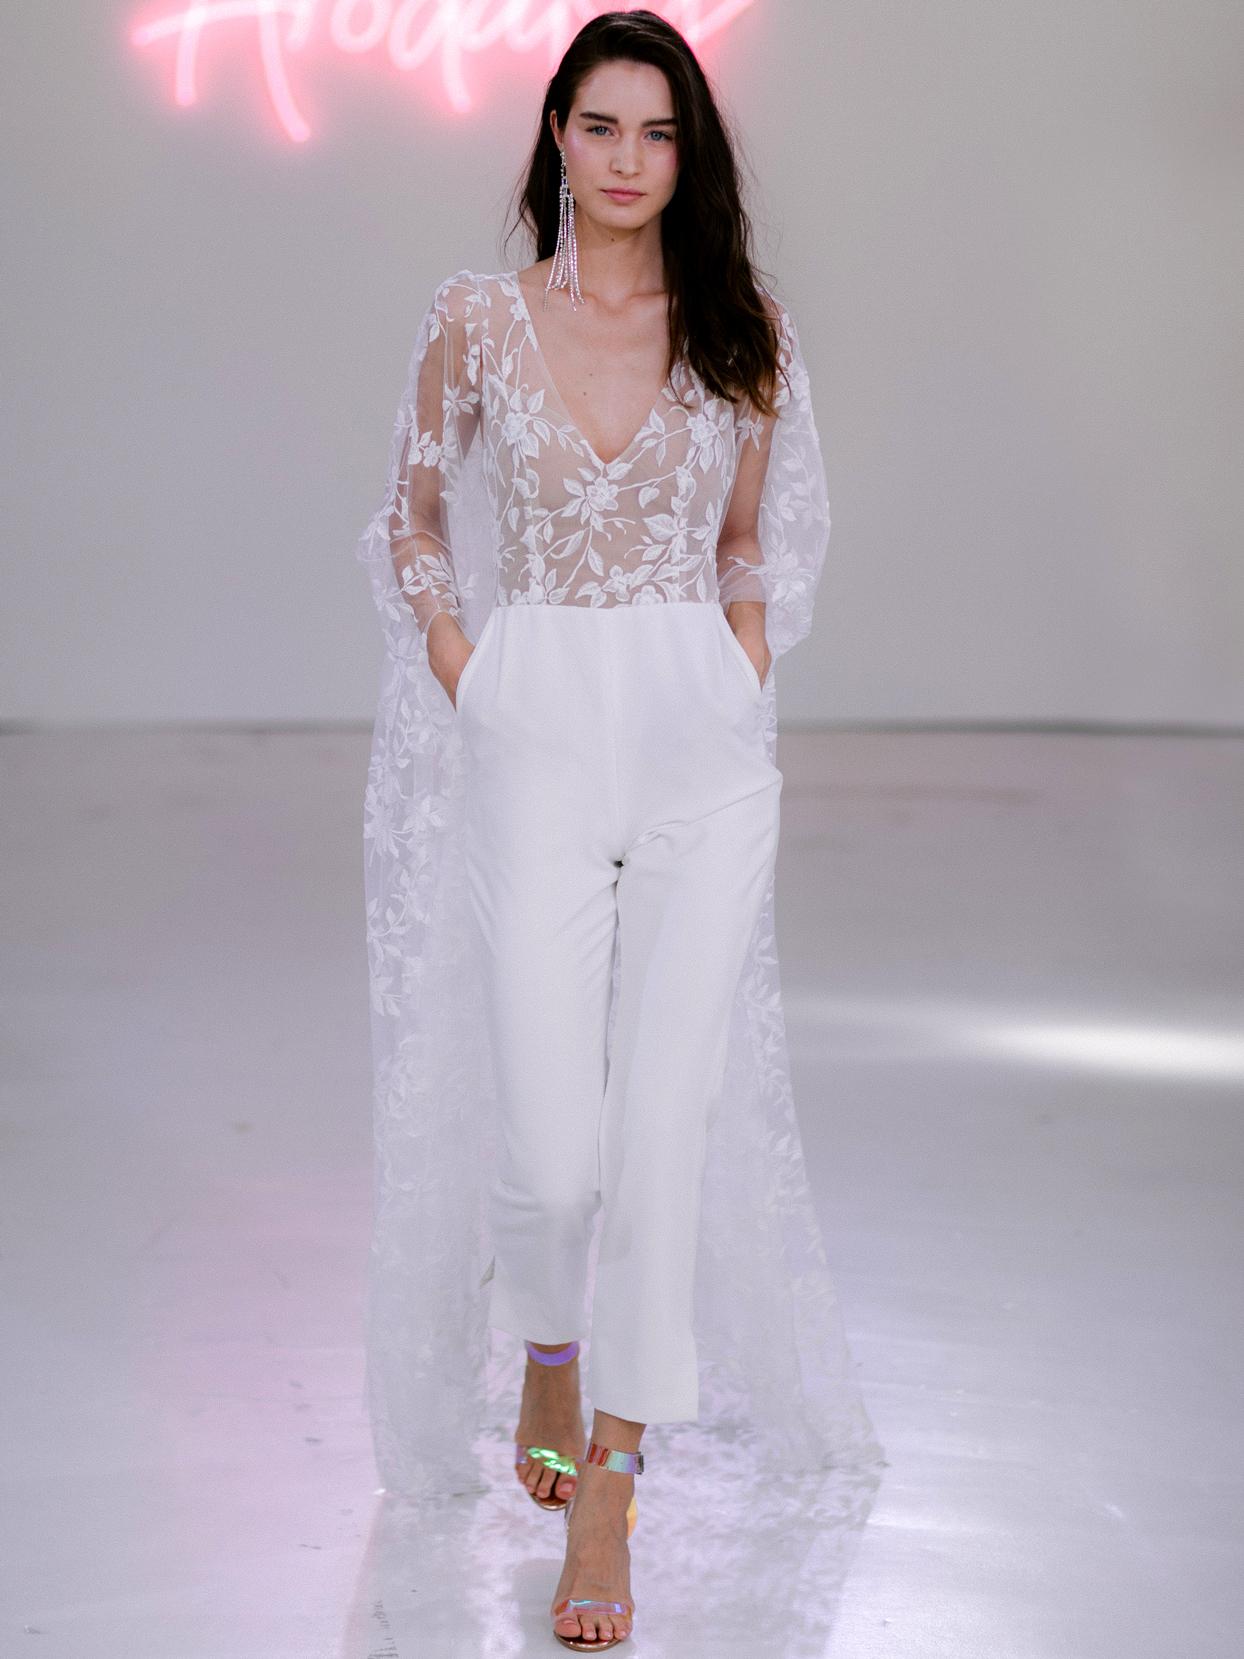 Rime Arodaky X The Mews Bridal sheer top pockets jumpsuit wedding dress fall 2020